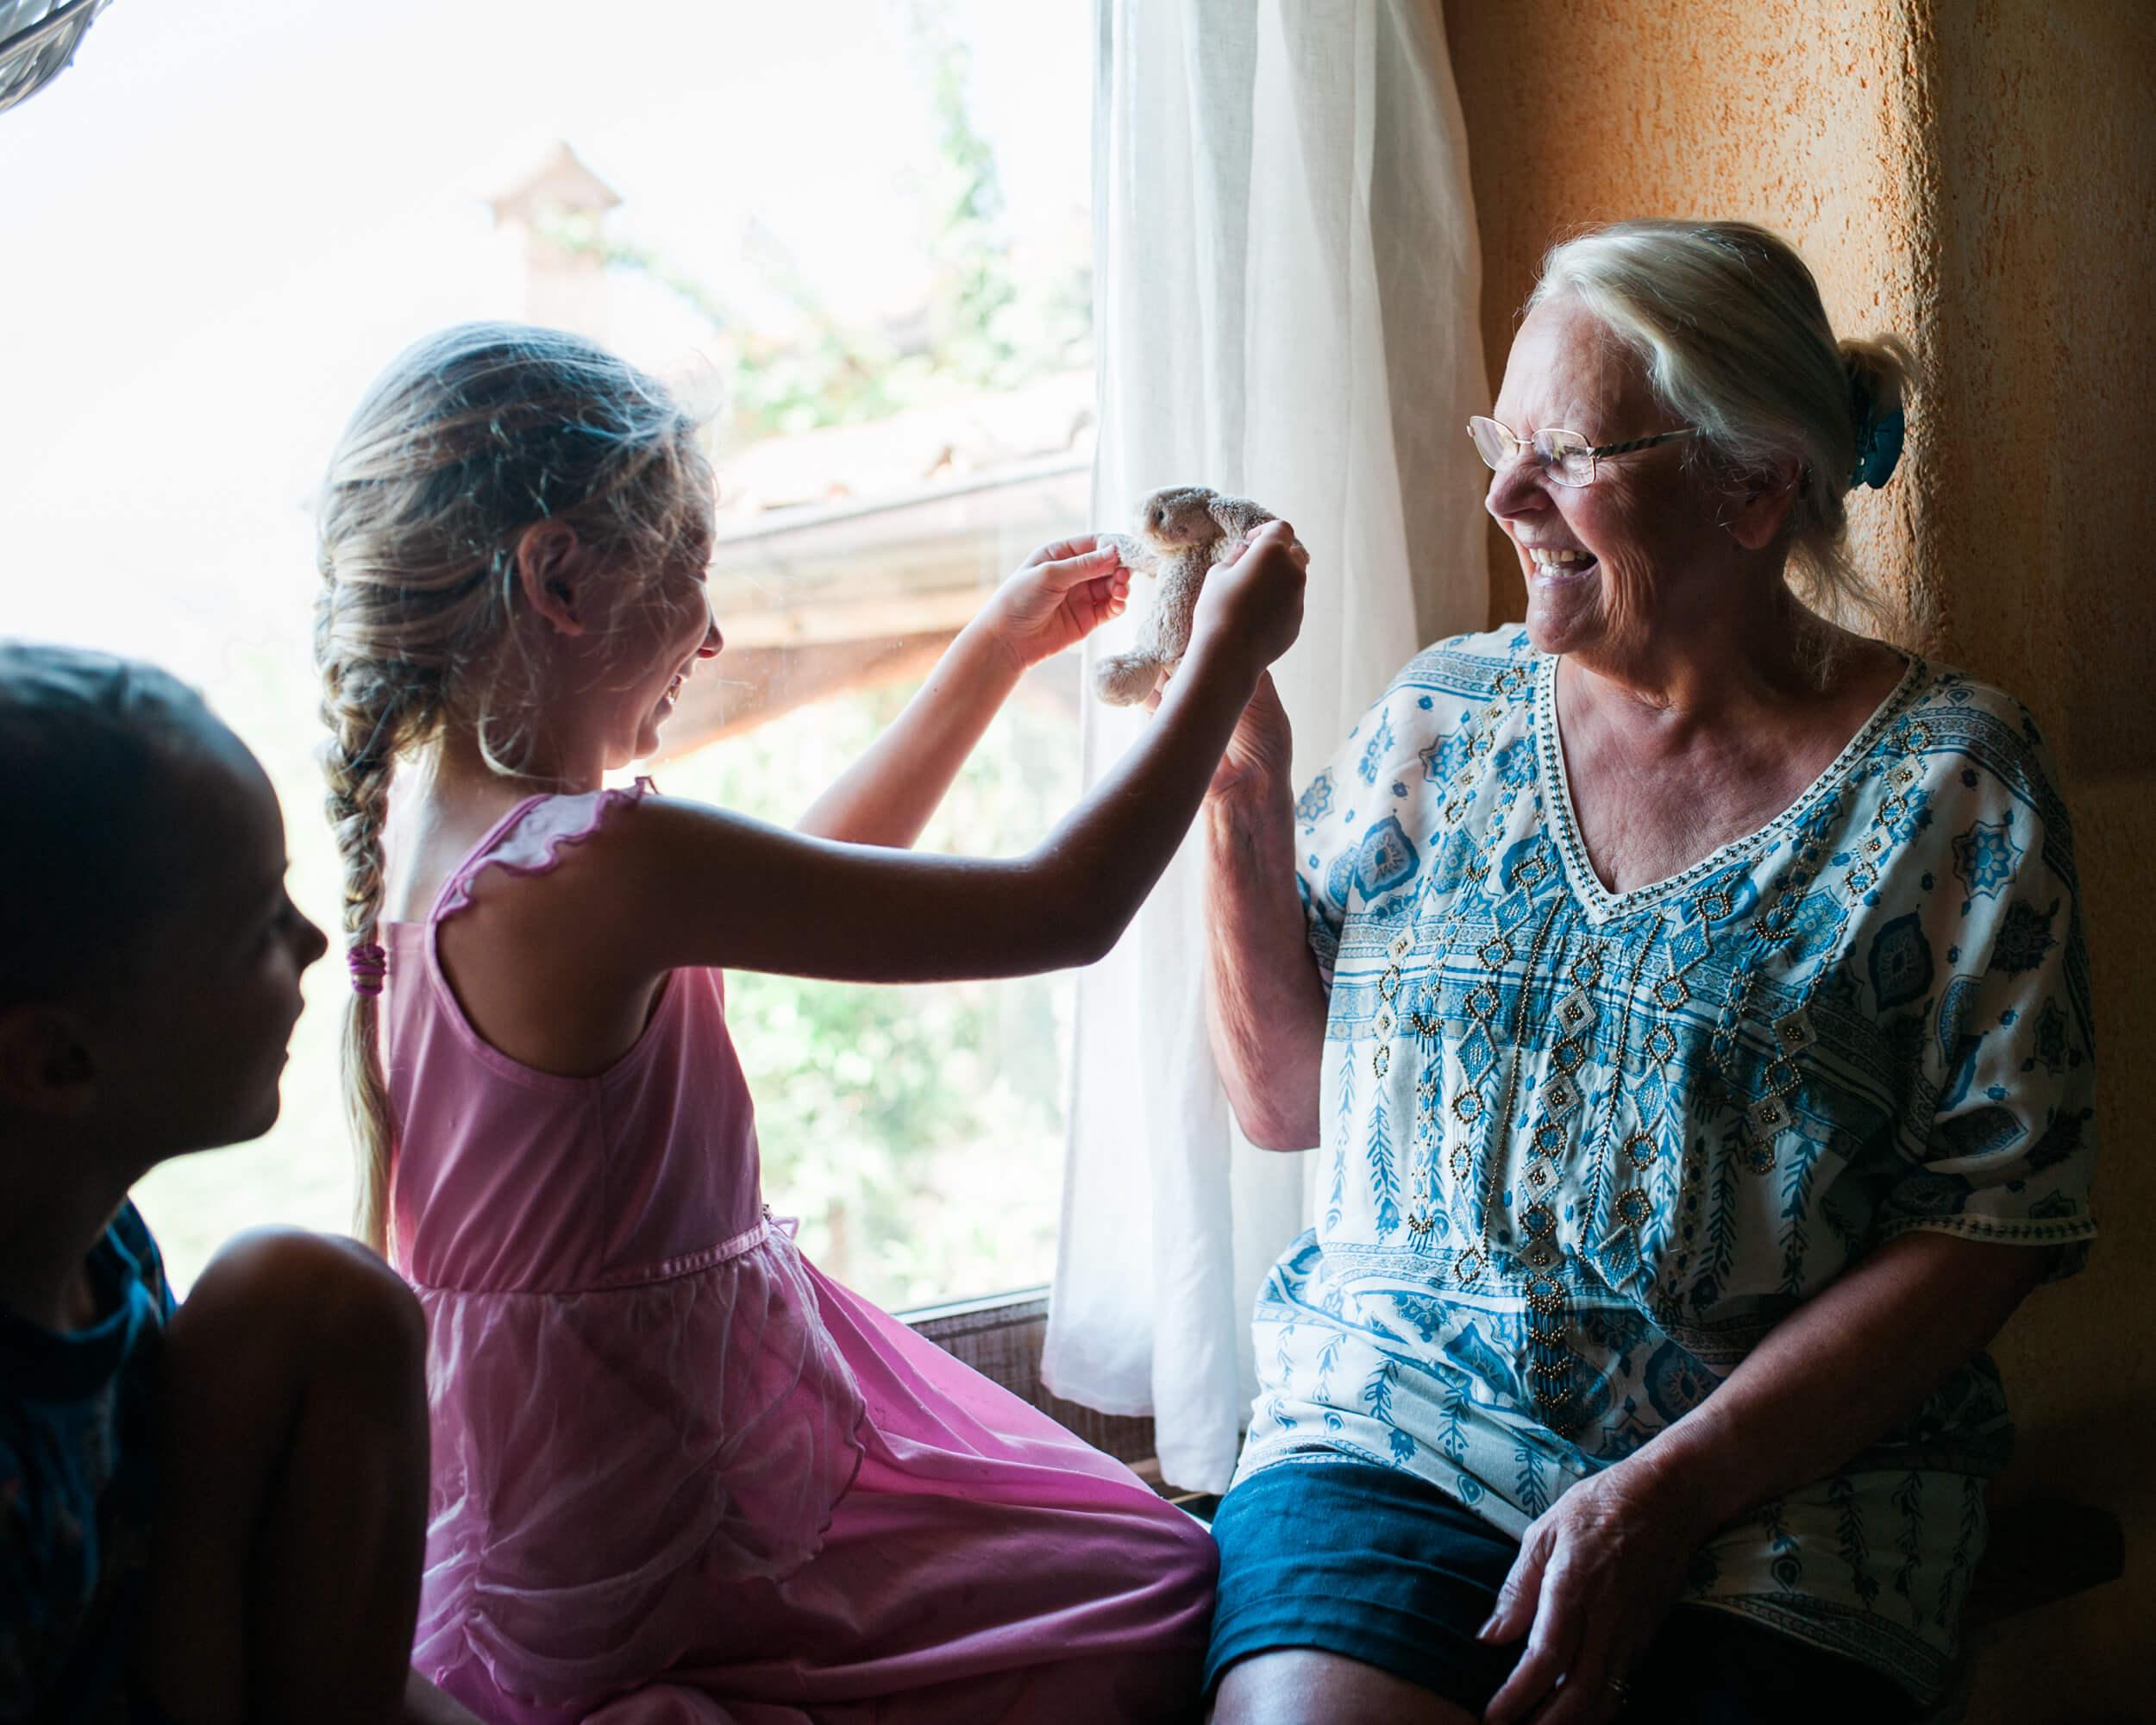 testimonials-family-christina-UK-by-lindsey-victoria-photography-7186